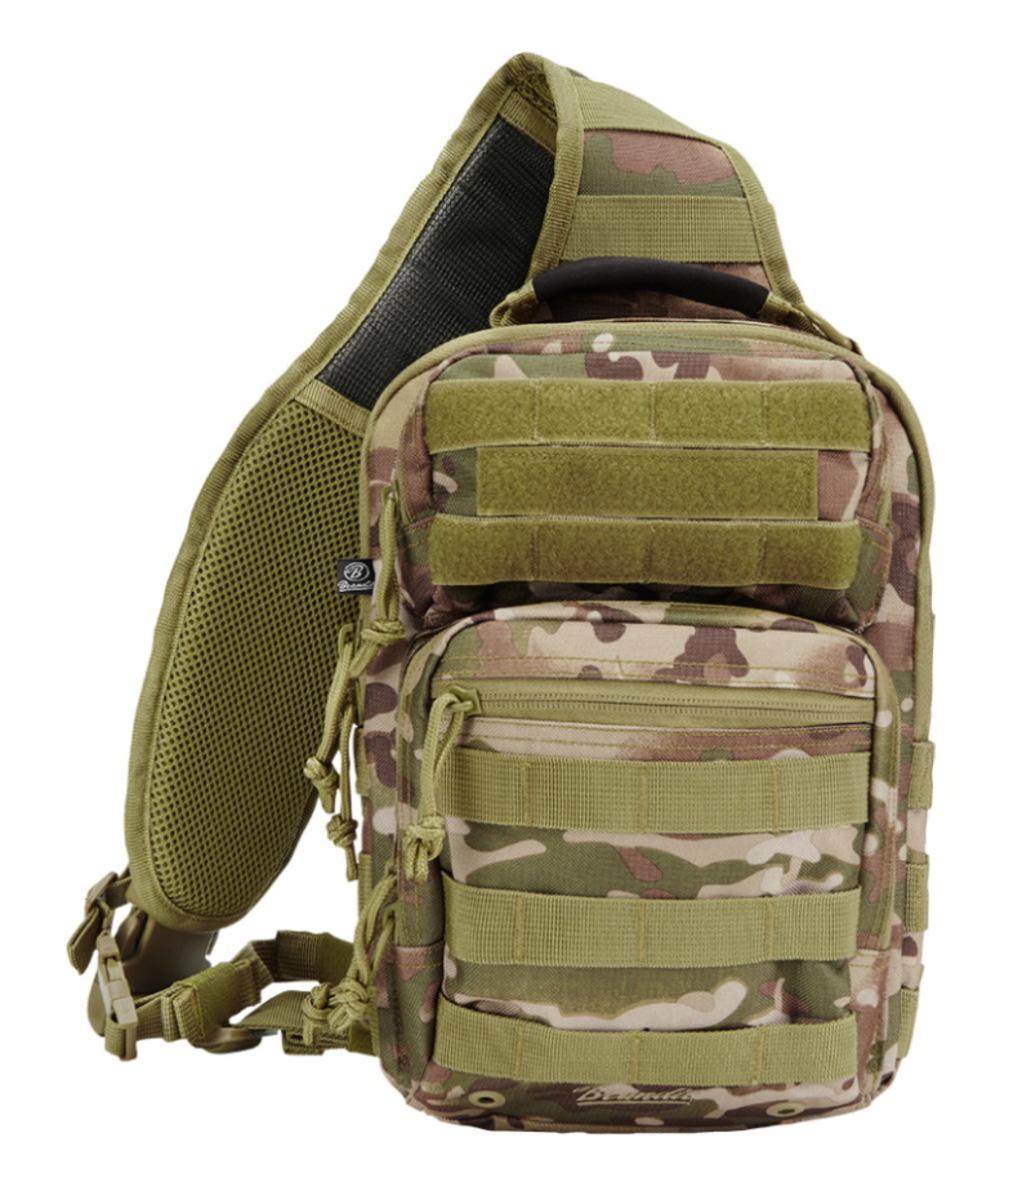 batoh (taška cez rameno) BRANDIT - US Cooper - 8036-tactical camo